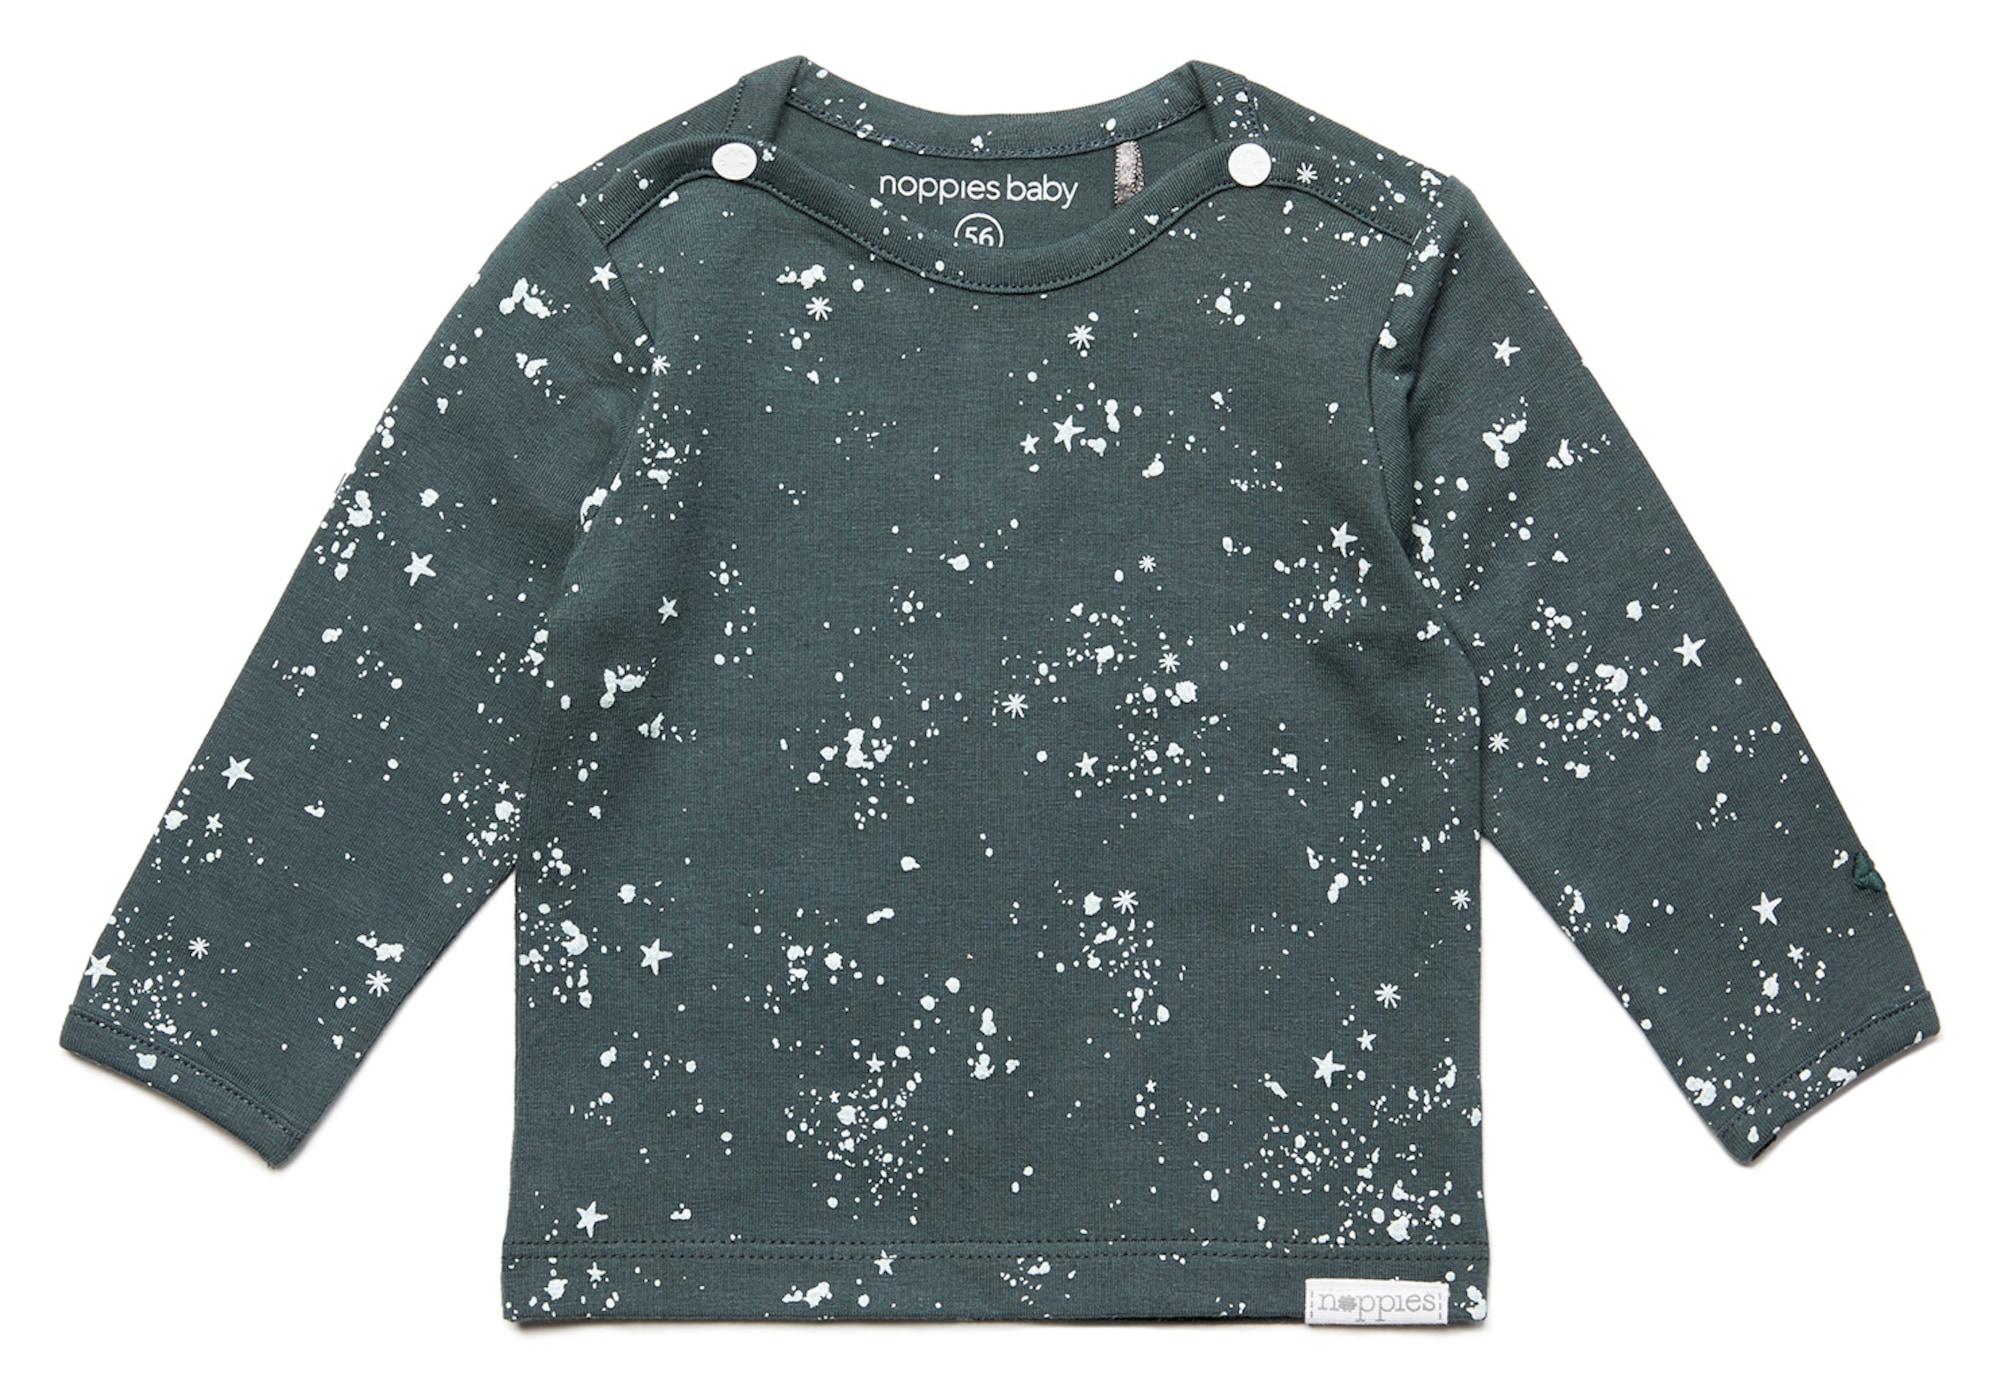 Noppies Marškinėliai 'Gale' bazalto pilka / balta